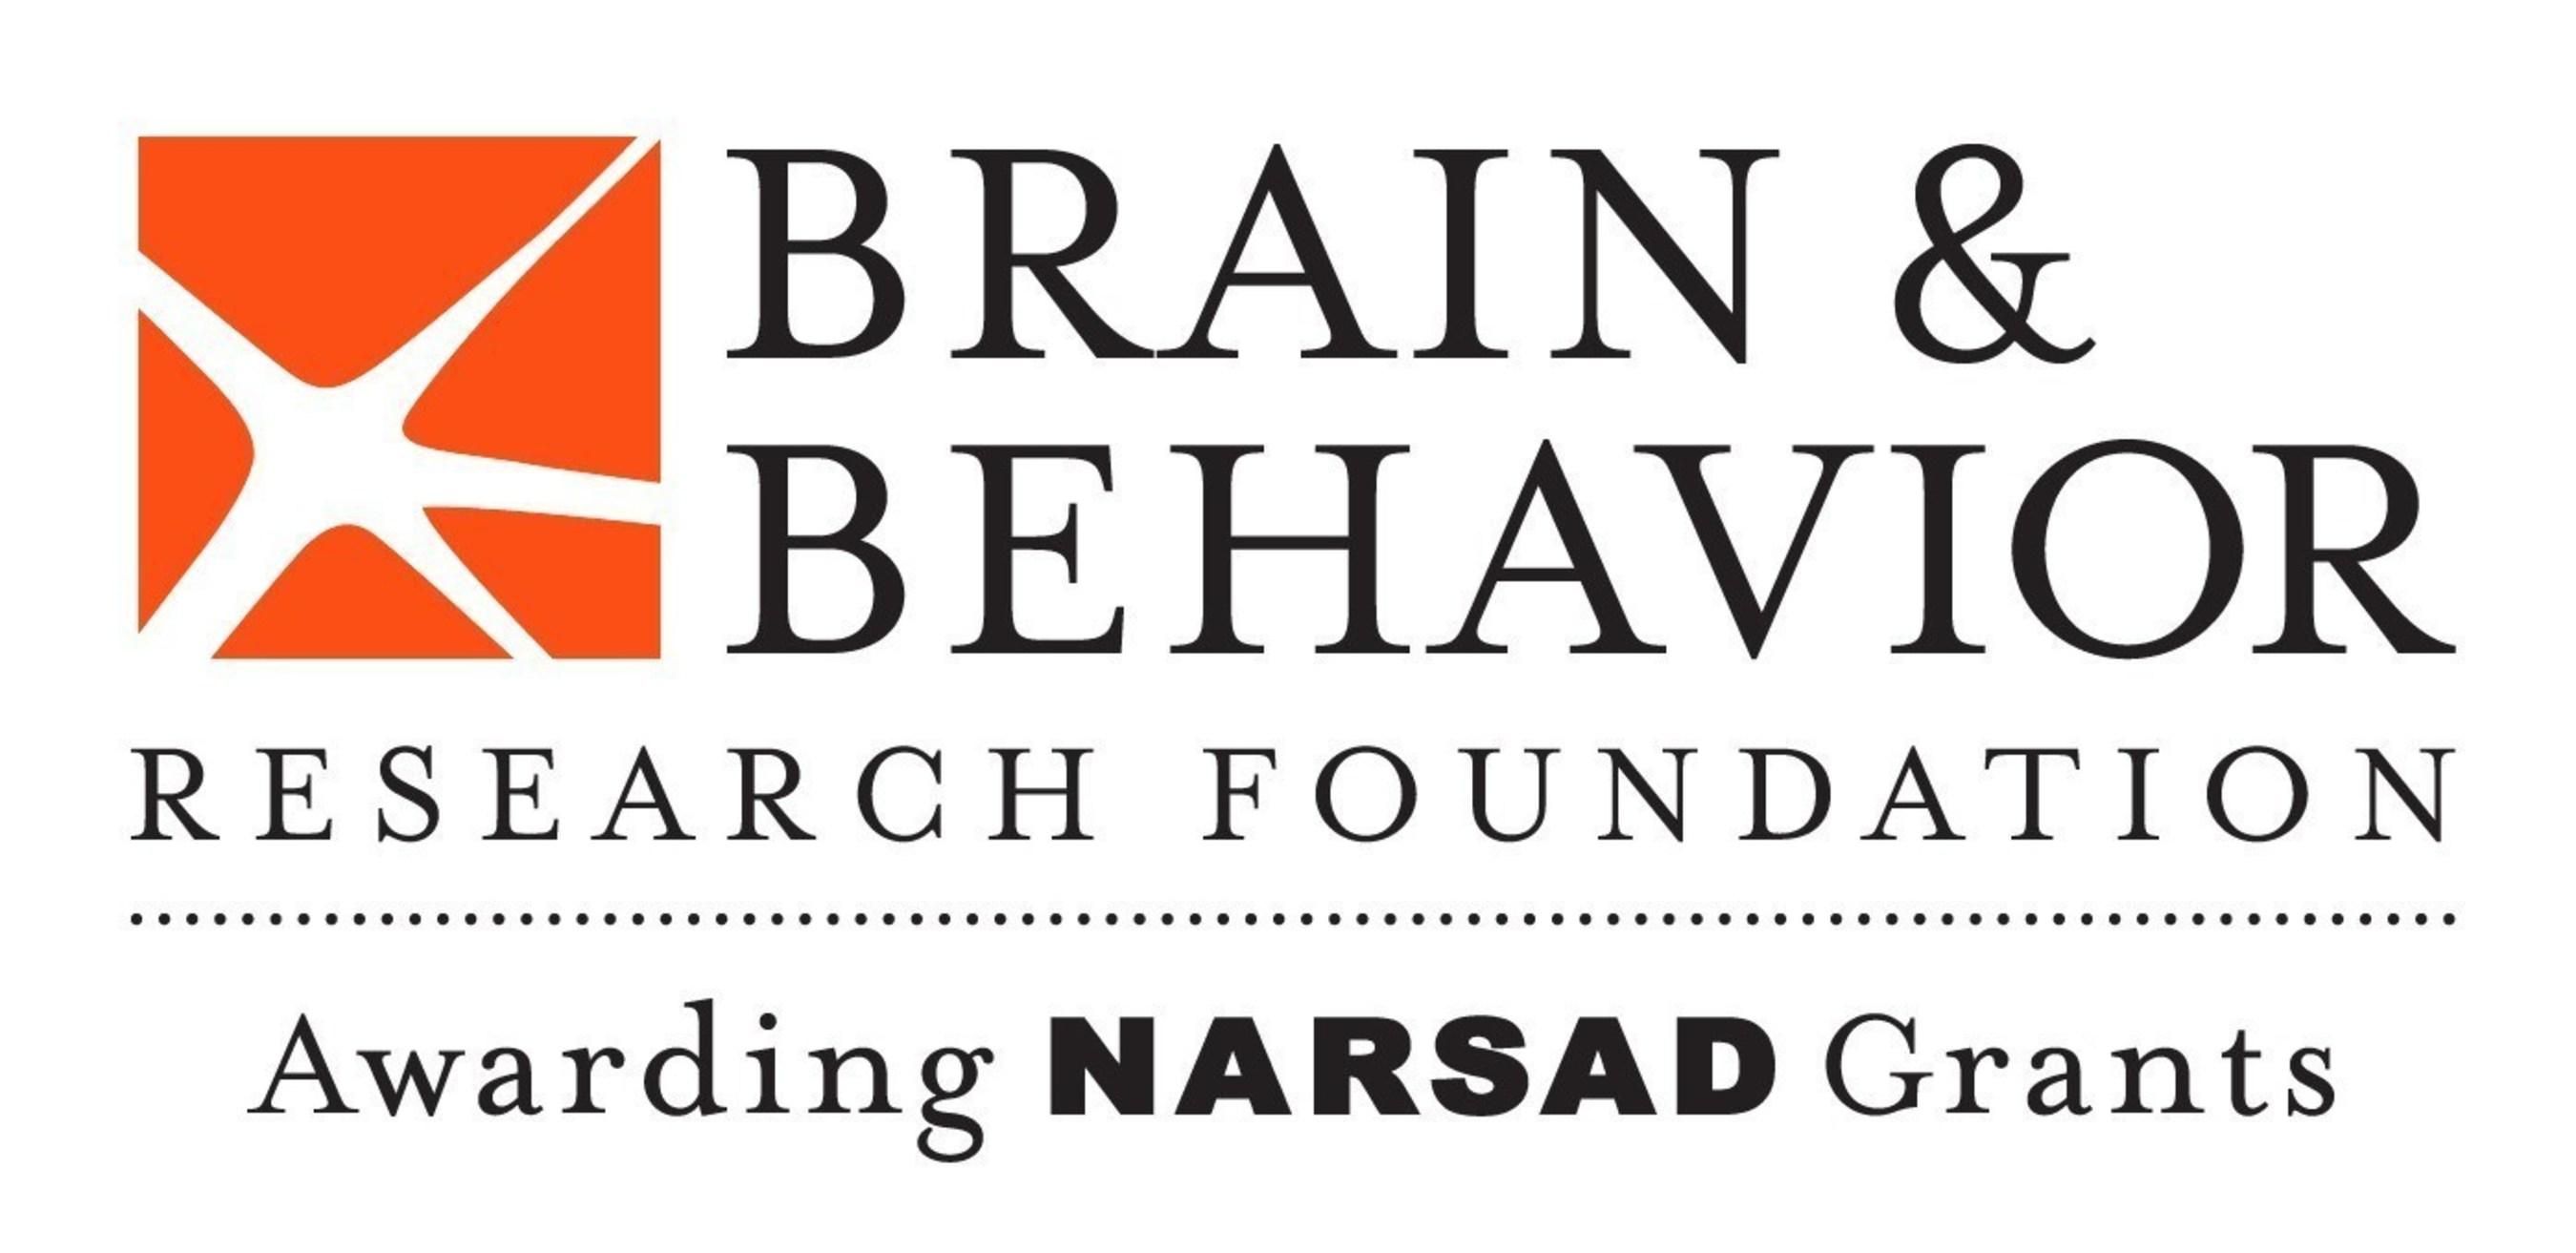 Brain & Behavior Research Foundation Logo